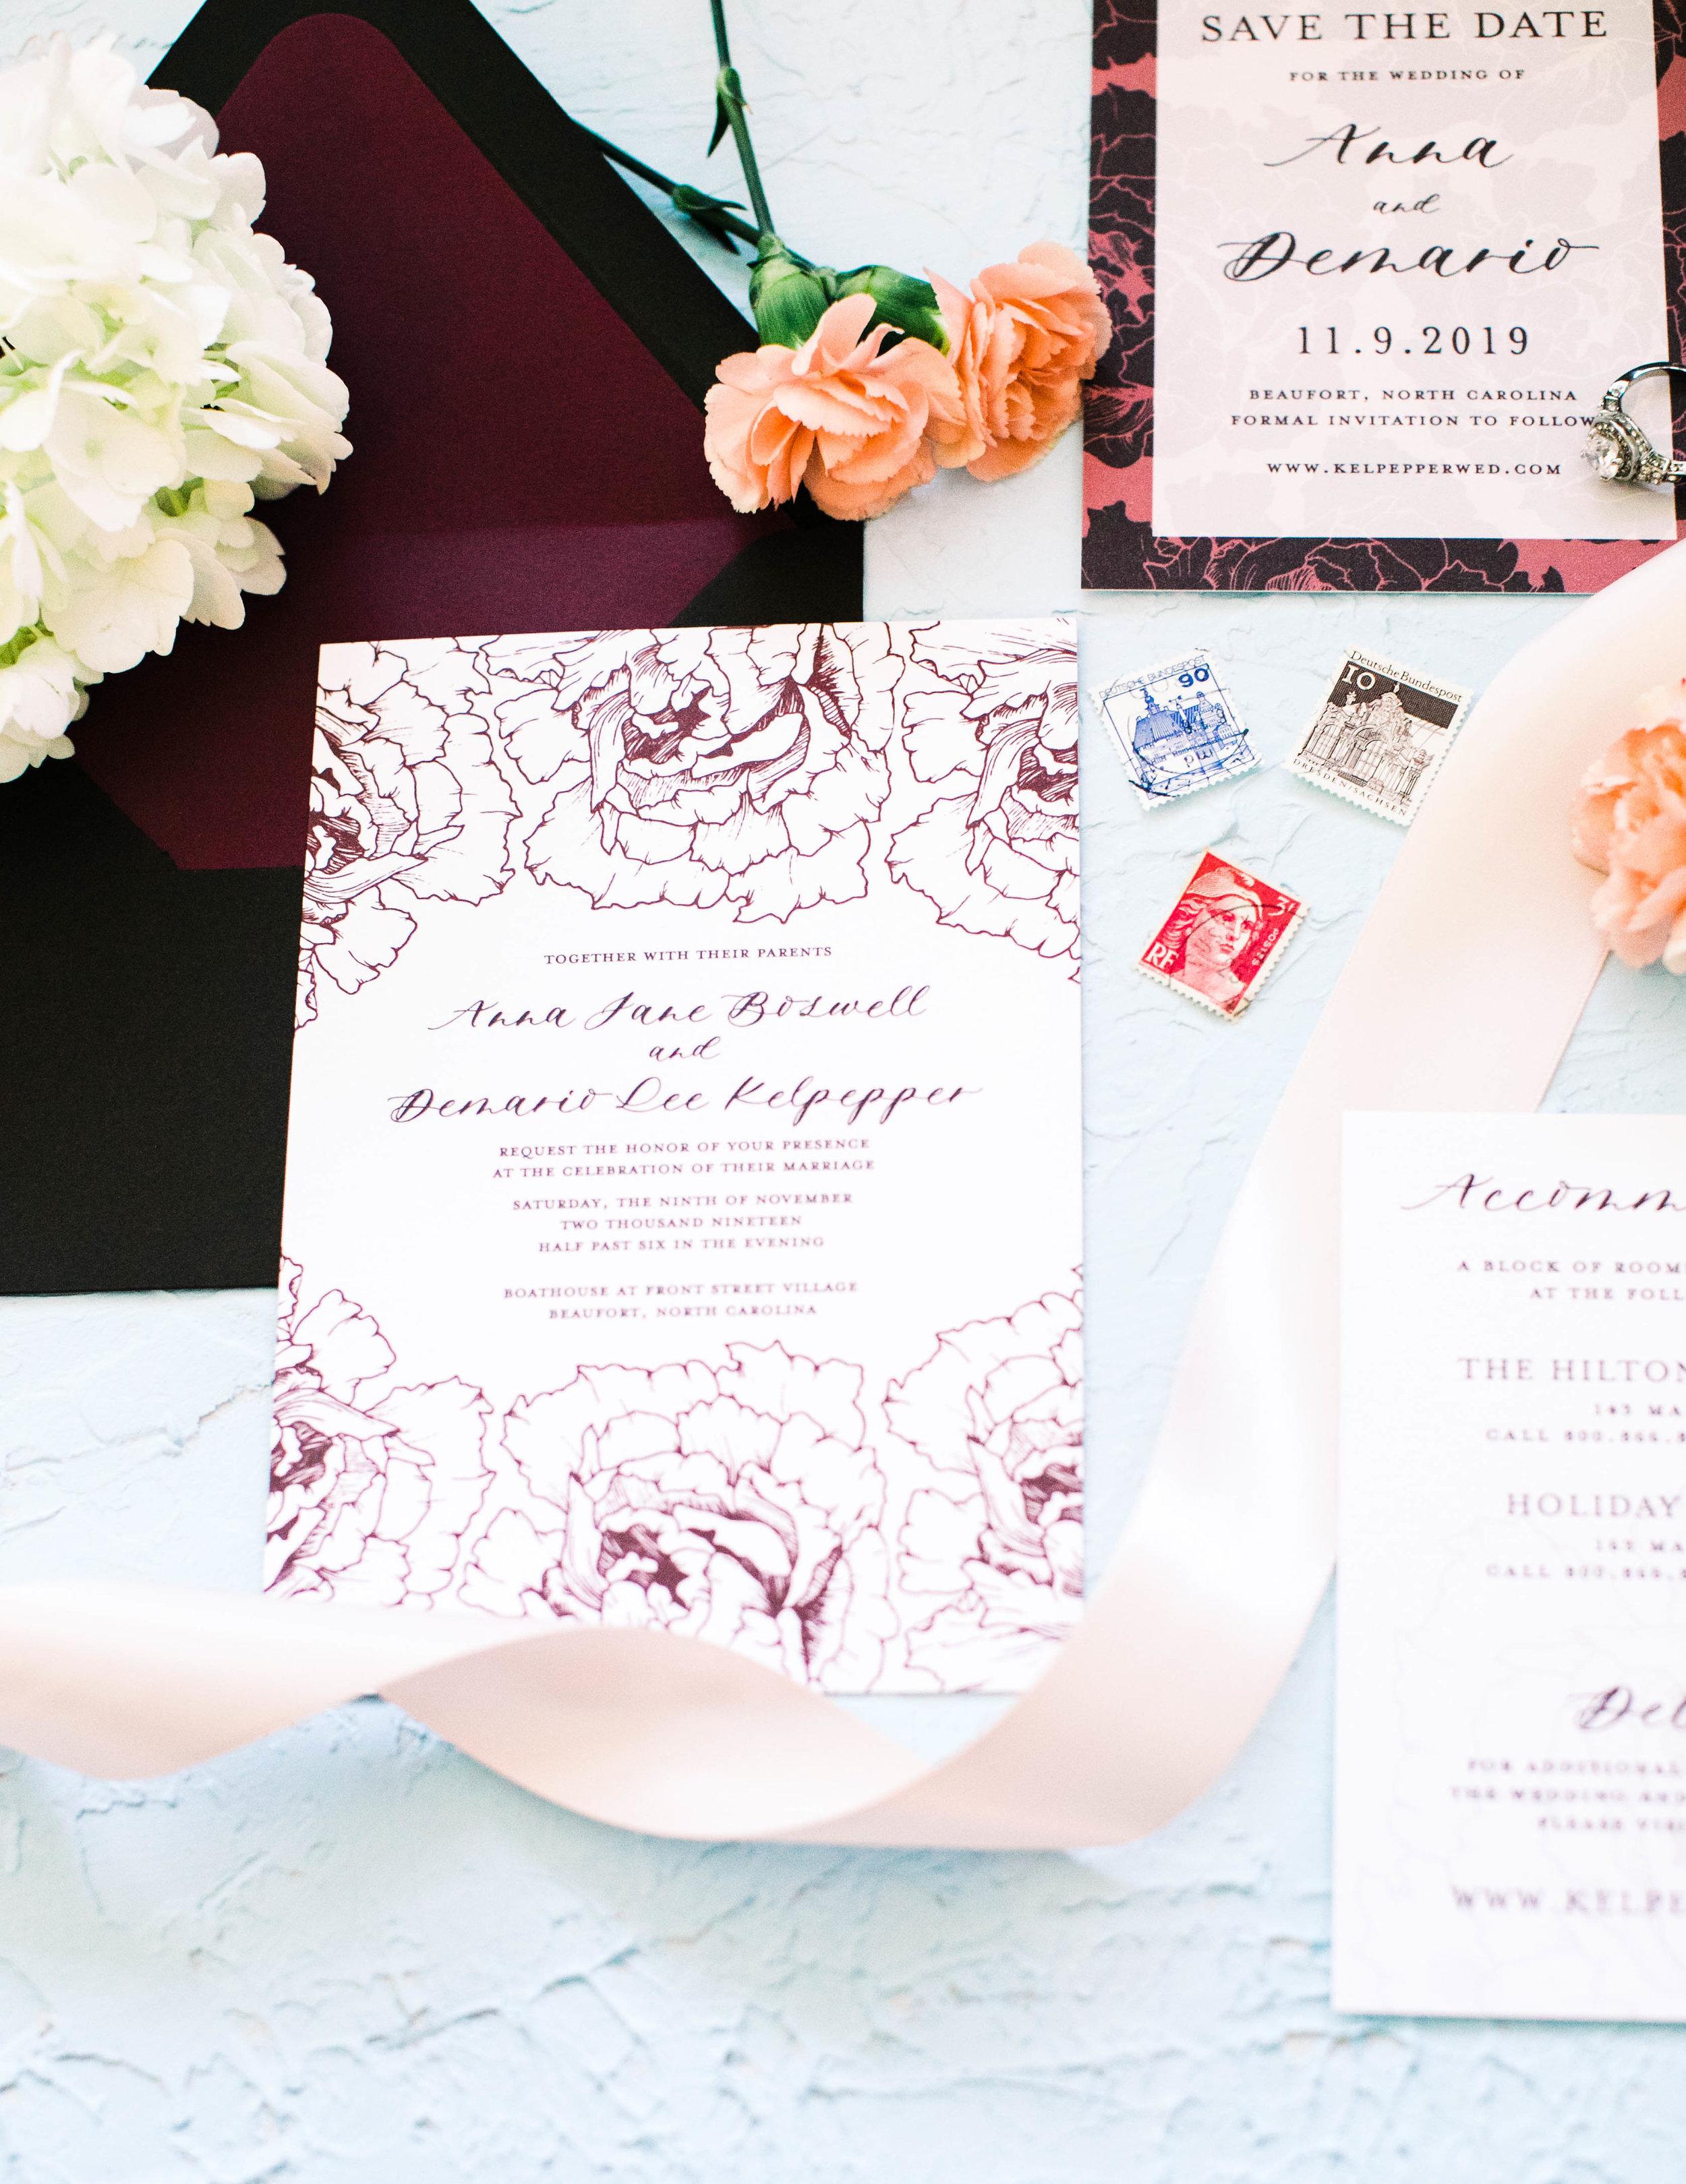 Anna Hand Drawn Wedding Invitation Burgundy Peonies Feathered Heart PrintsAnna 3W2A0353.jpg